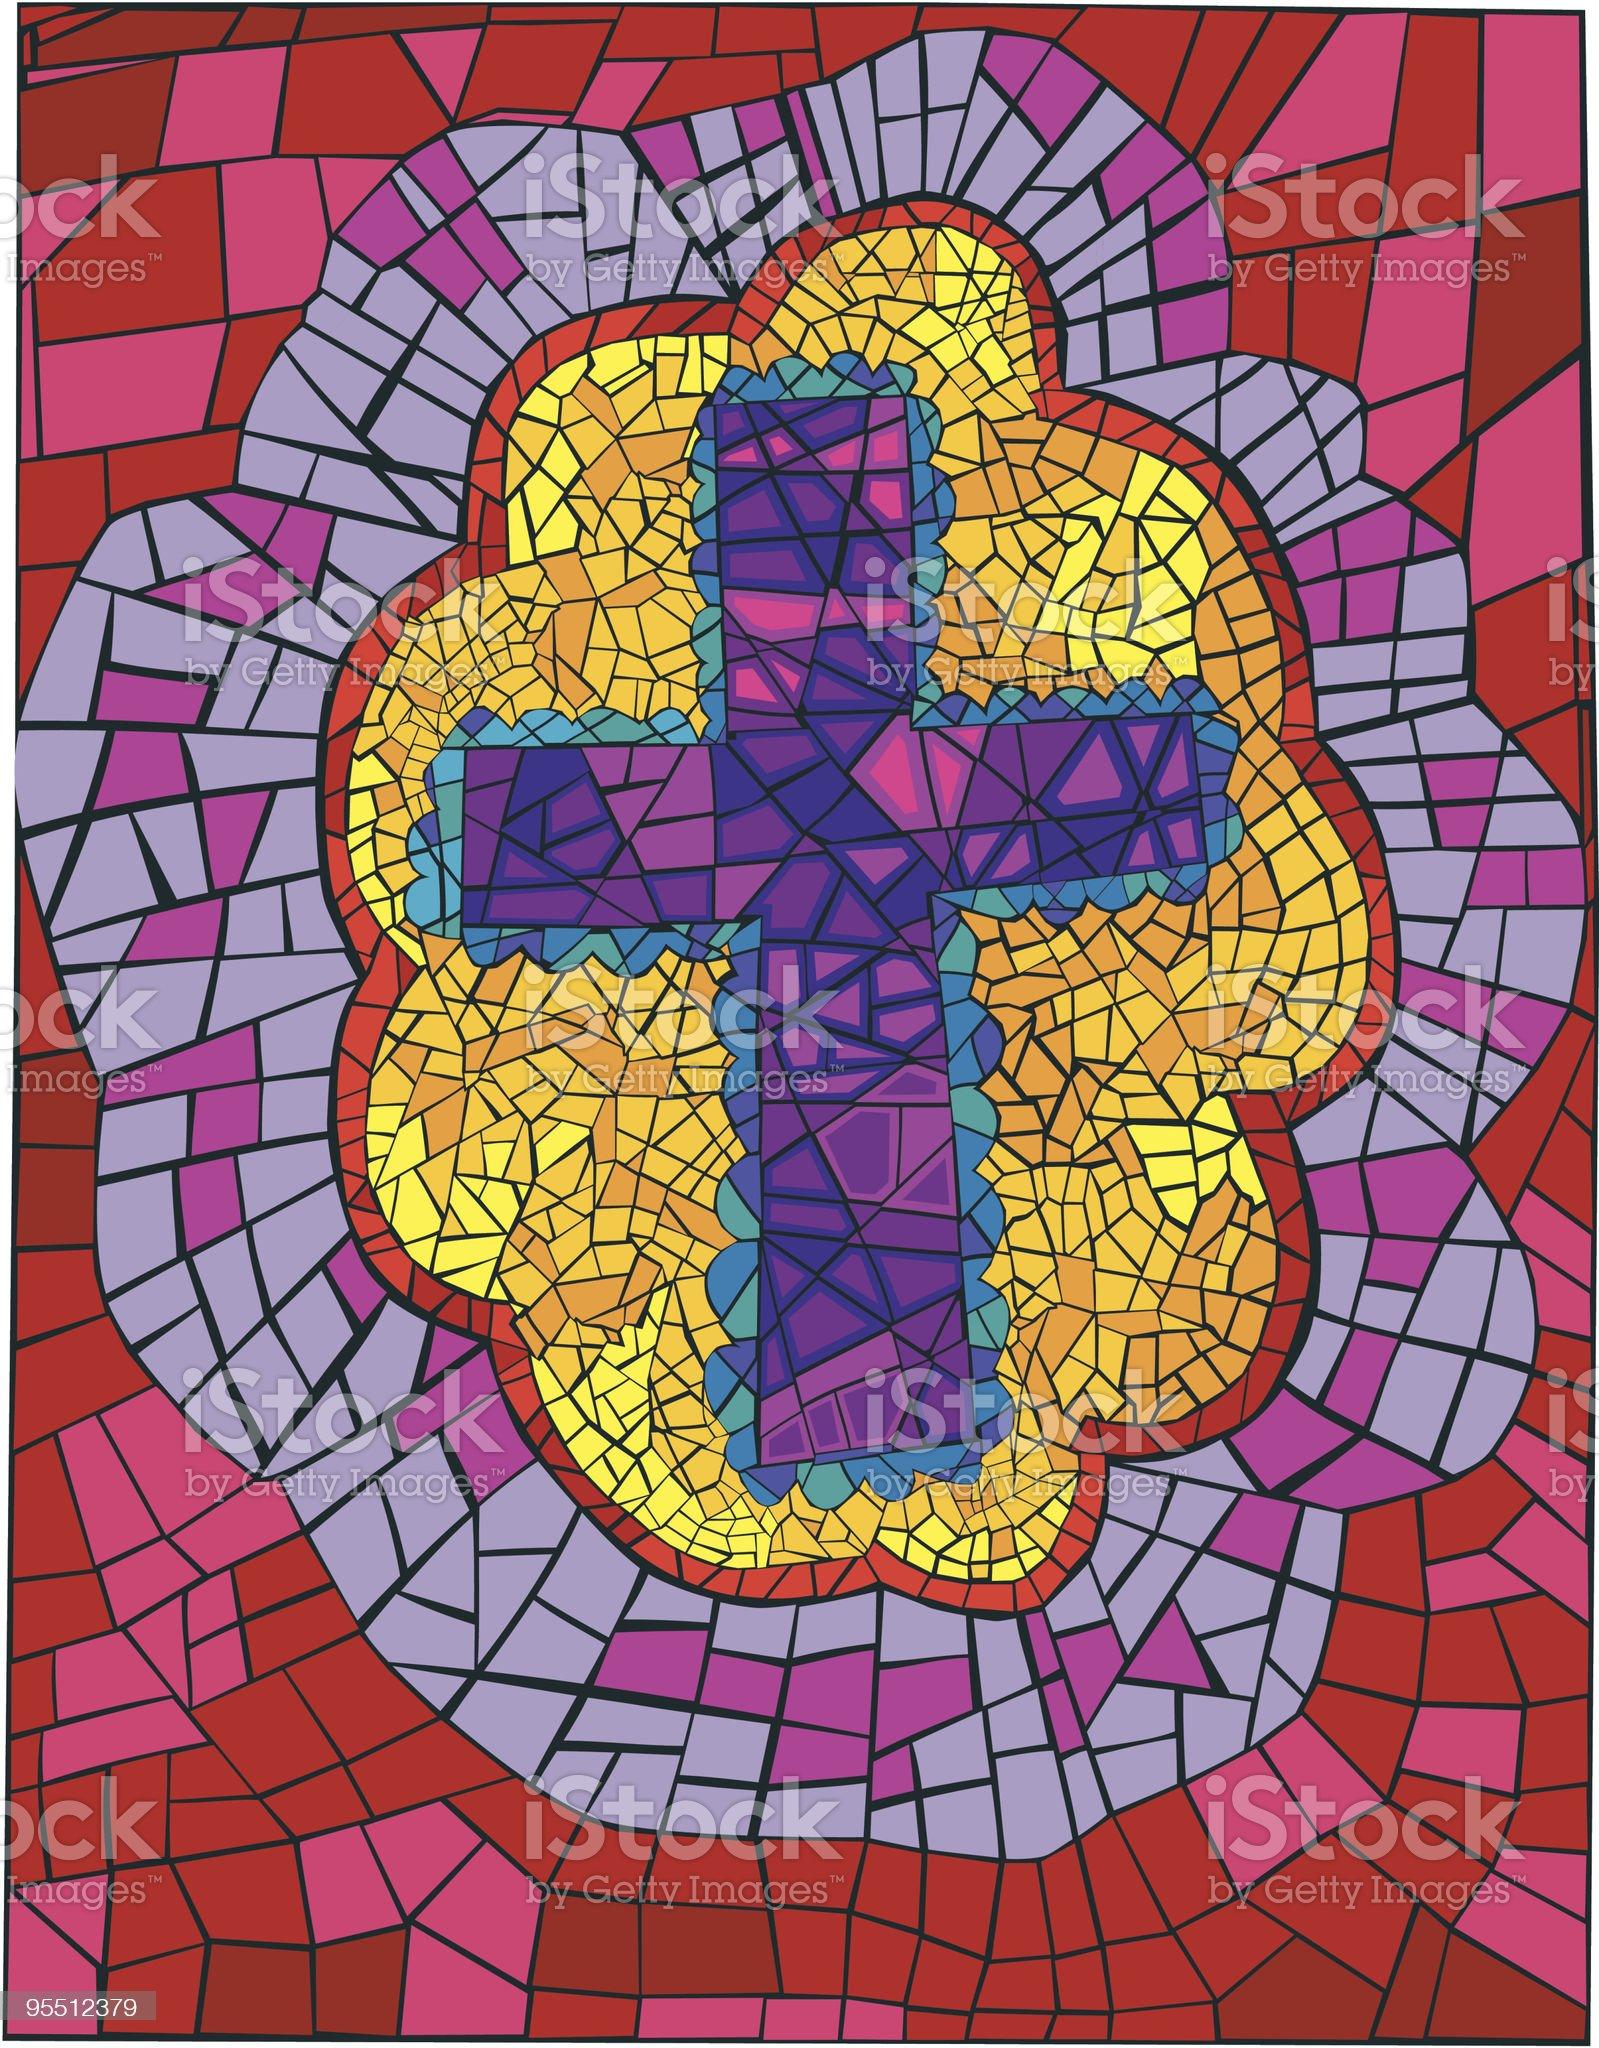 Bright Bordered Mosaic Cross royalty-free stock vector art